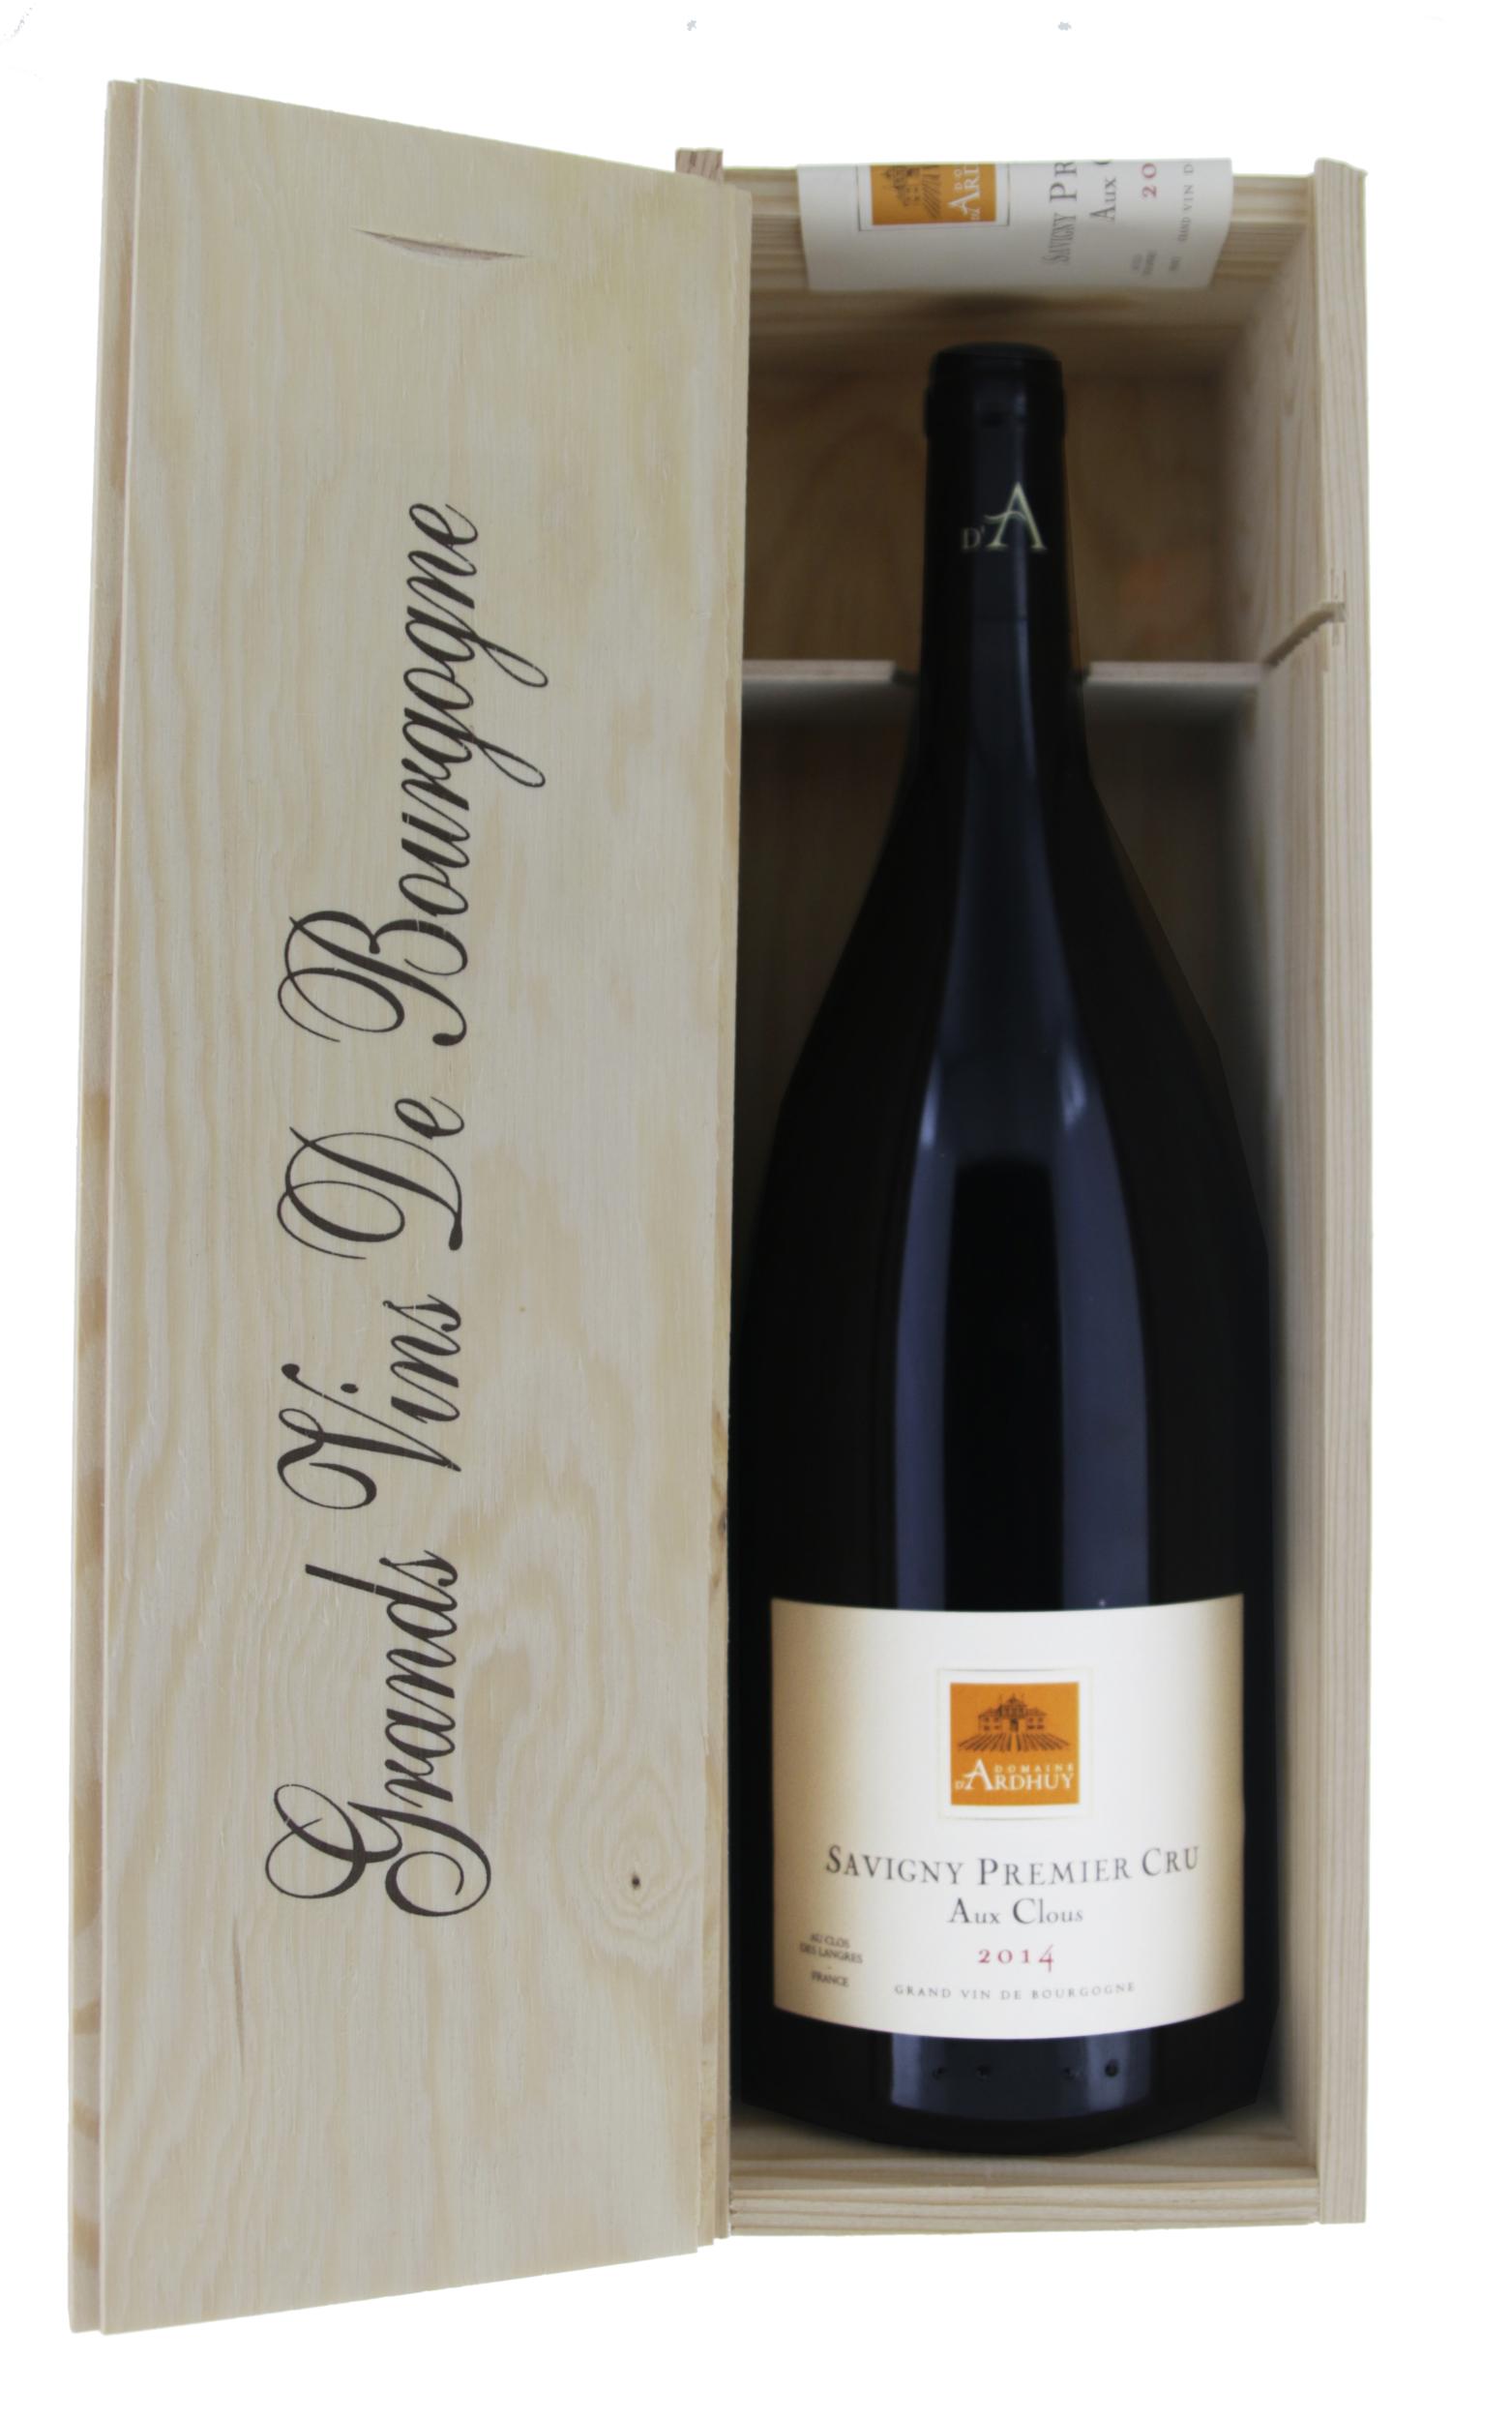 Savigny 1er Cru Aux Clous - Domaine D\'Ardhuy - 2014 - Magnum